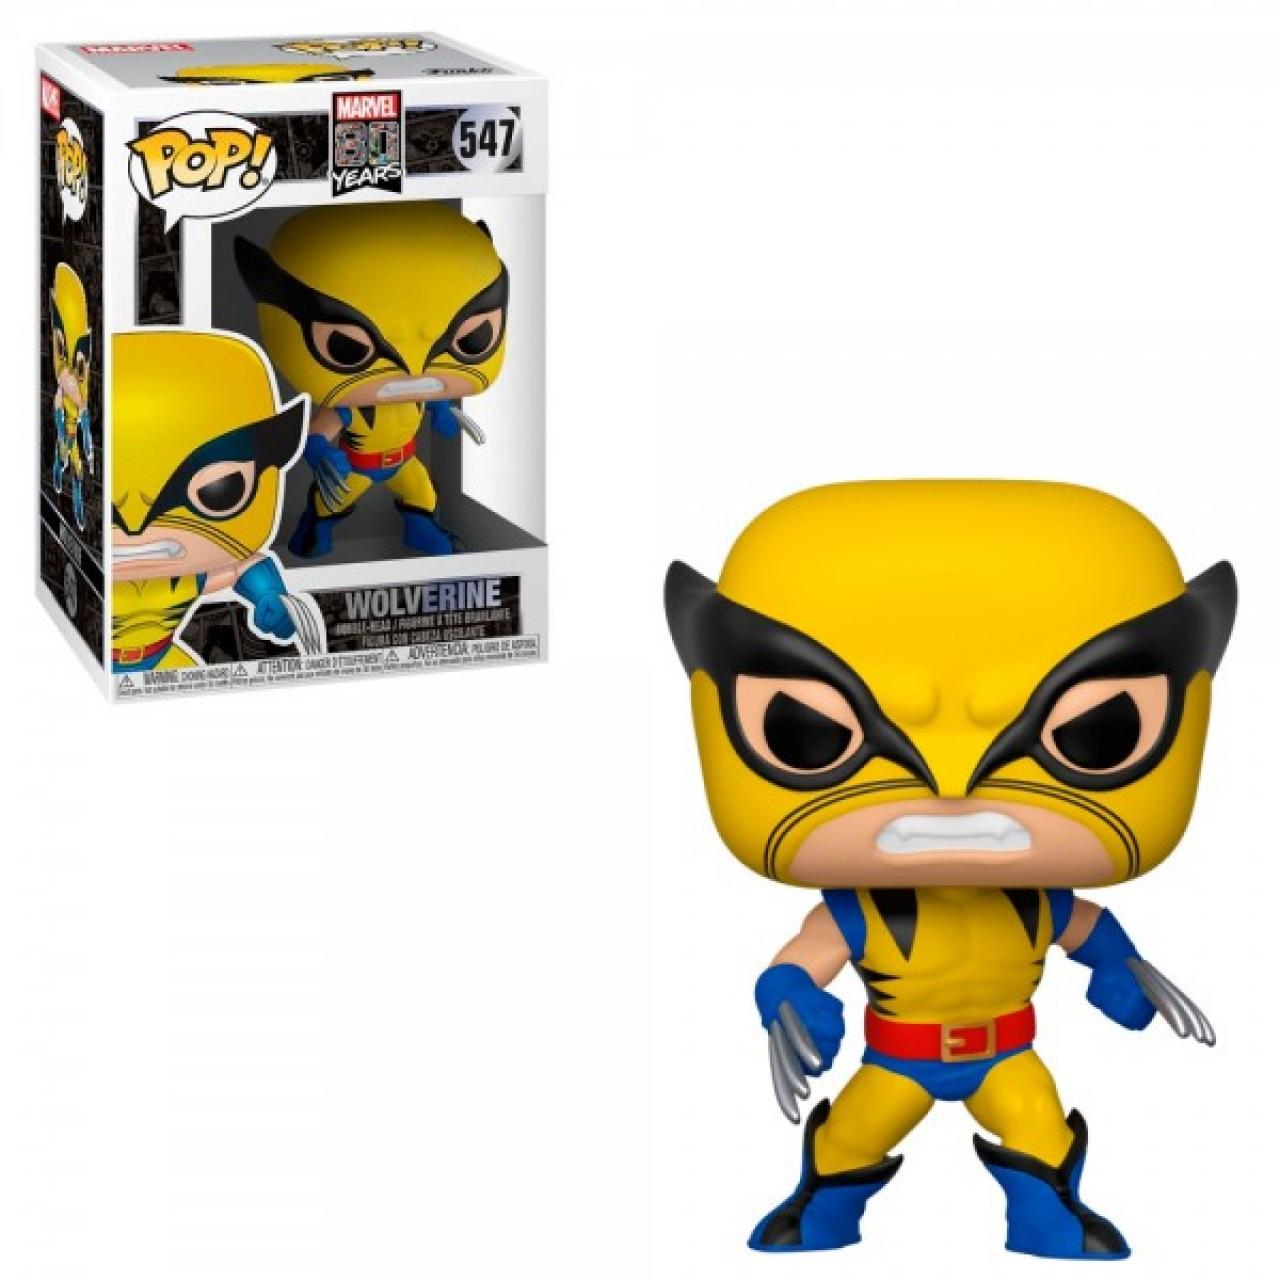 Фигурка Funko Pop Мстители Марвел: Росомаха первое издание (44155) #547 Marvel First Appearance - Wolverine